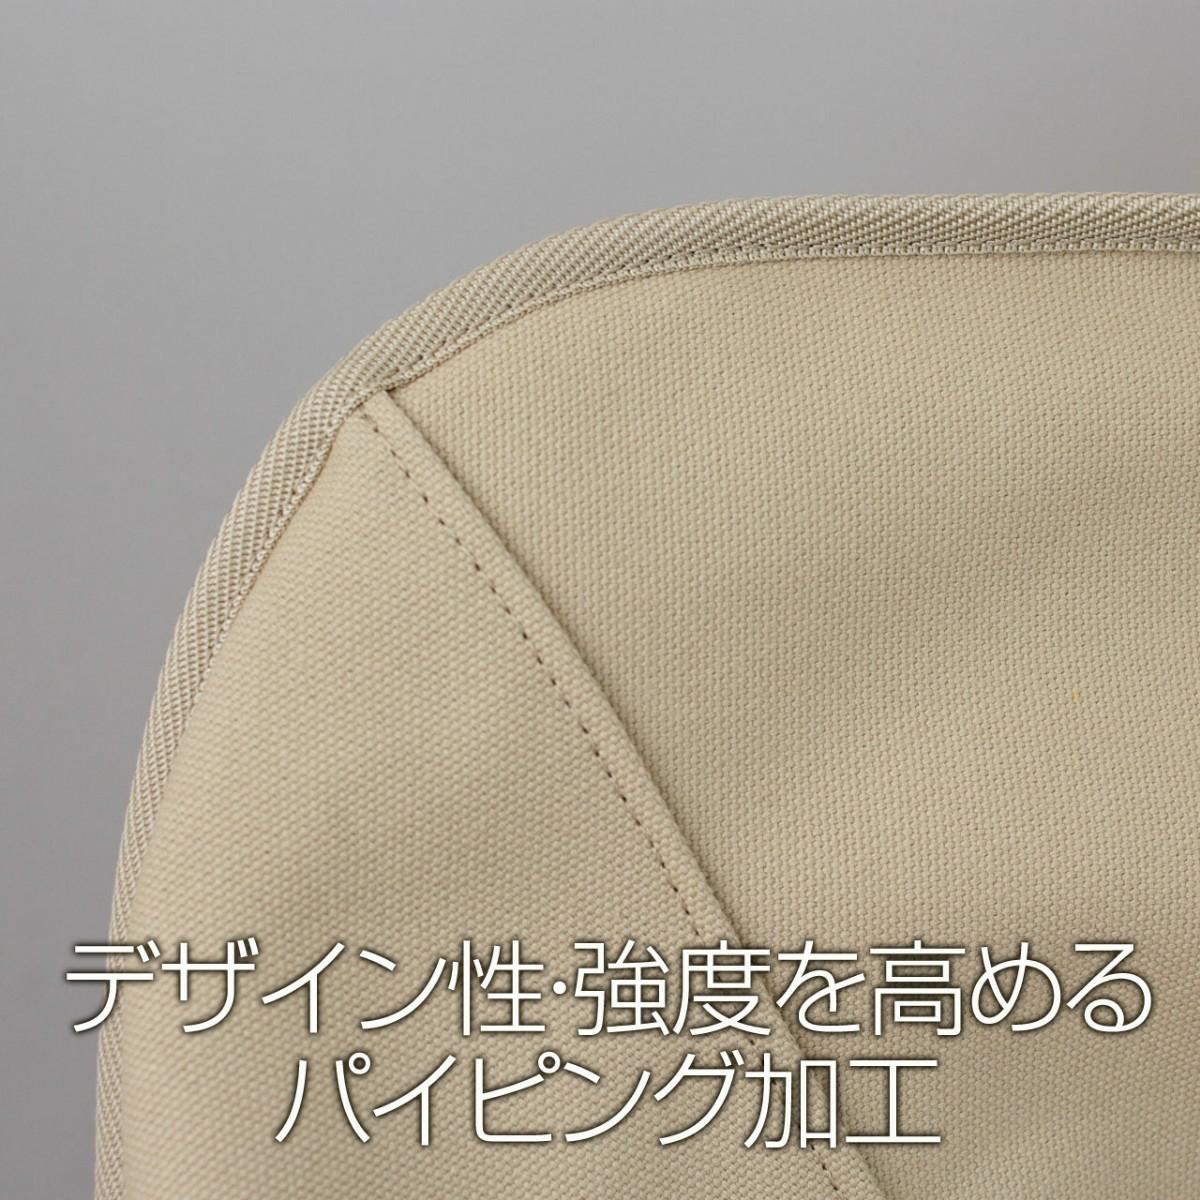 Helinox ヘリノックス チェアワン 専用カバー(8号帆布・焚き火対応)SD